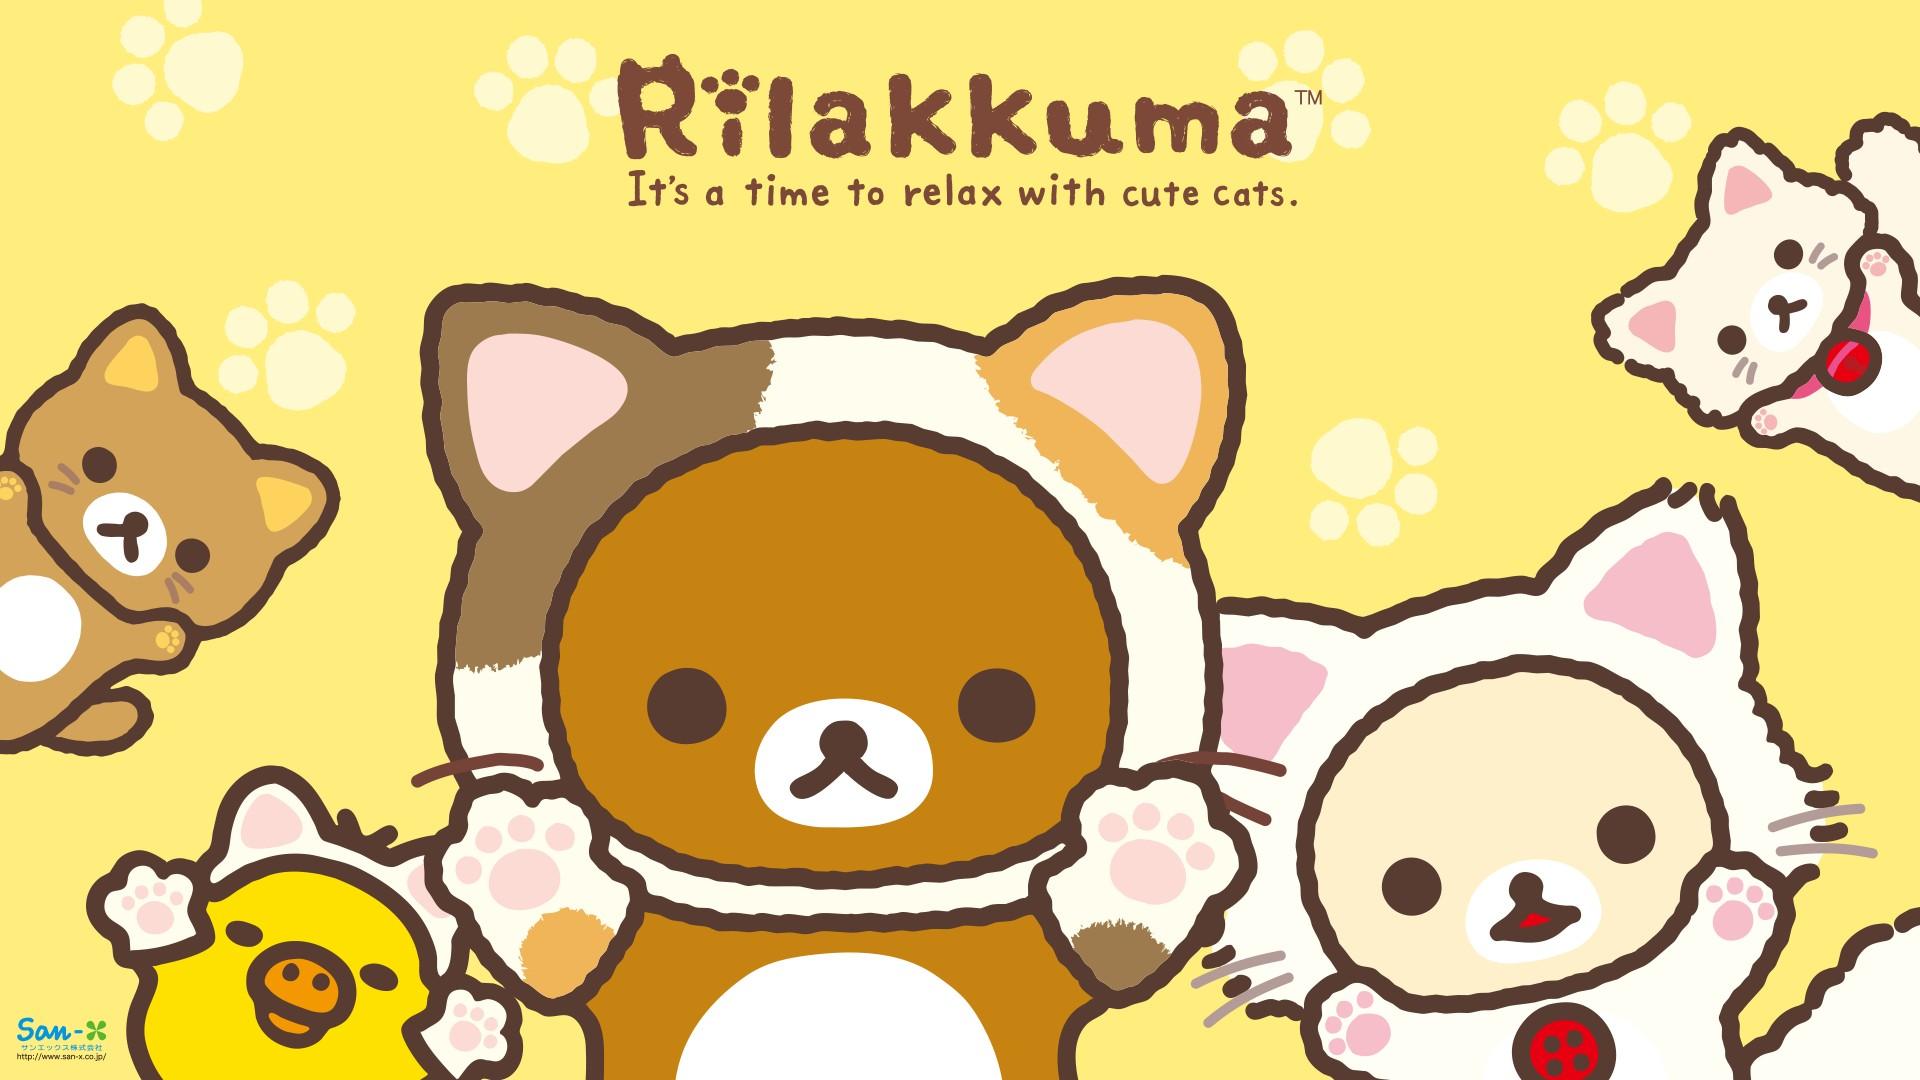 rilakkuma 3 wallpaper by - photo #25